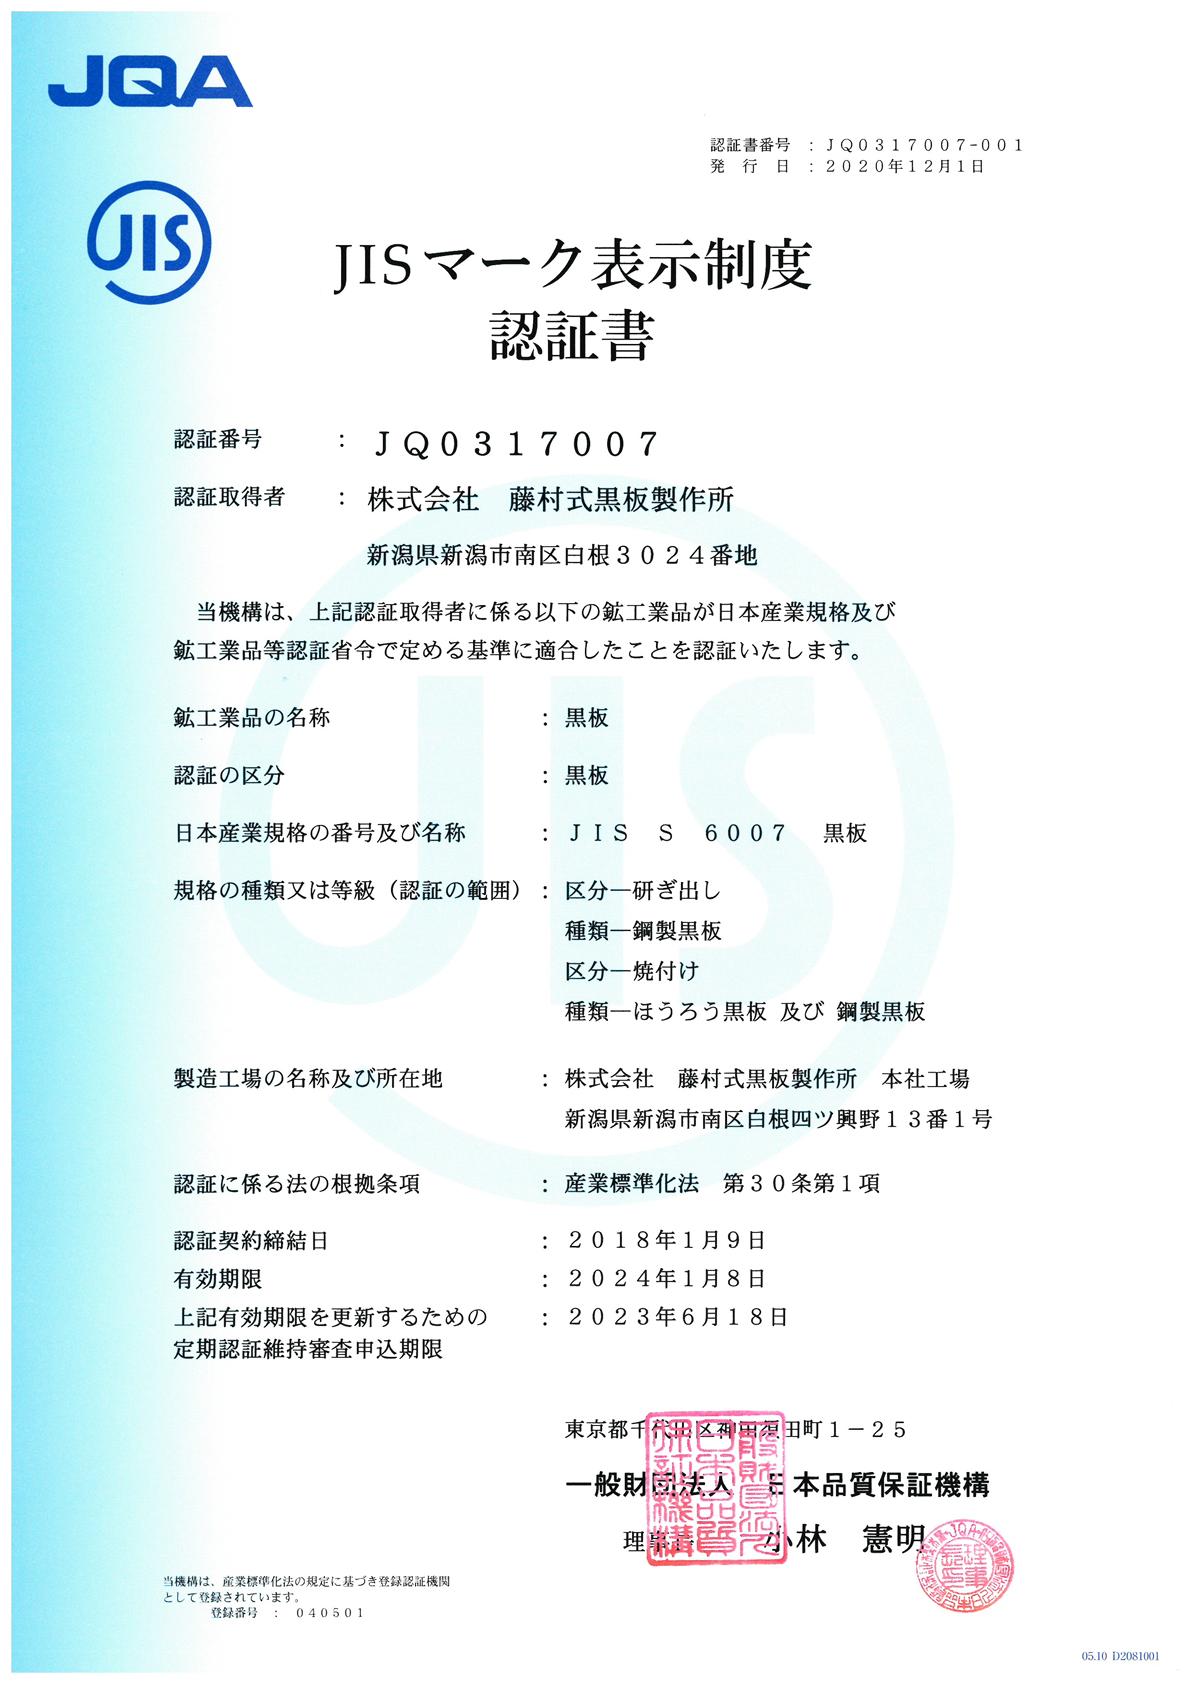 JISマーク表示制度認定書